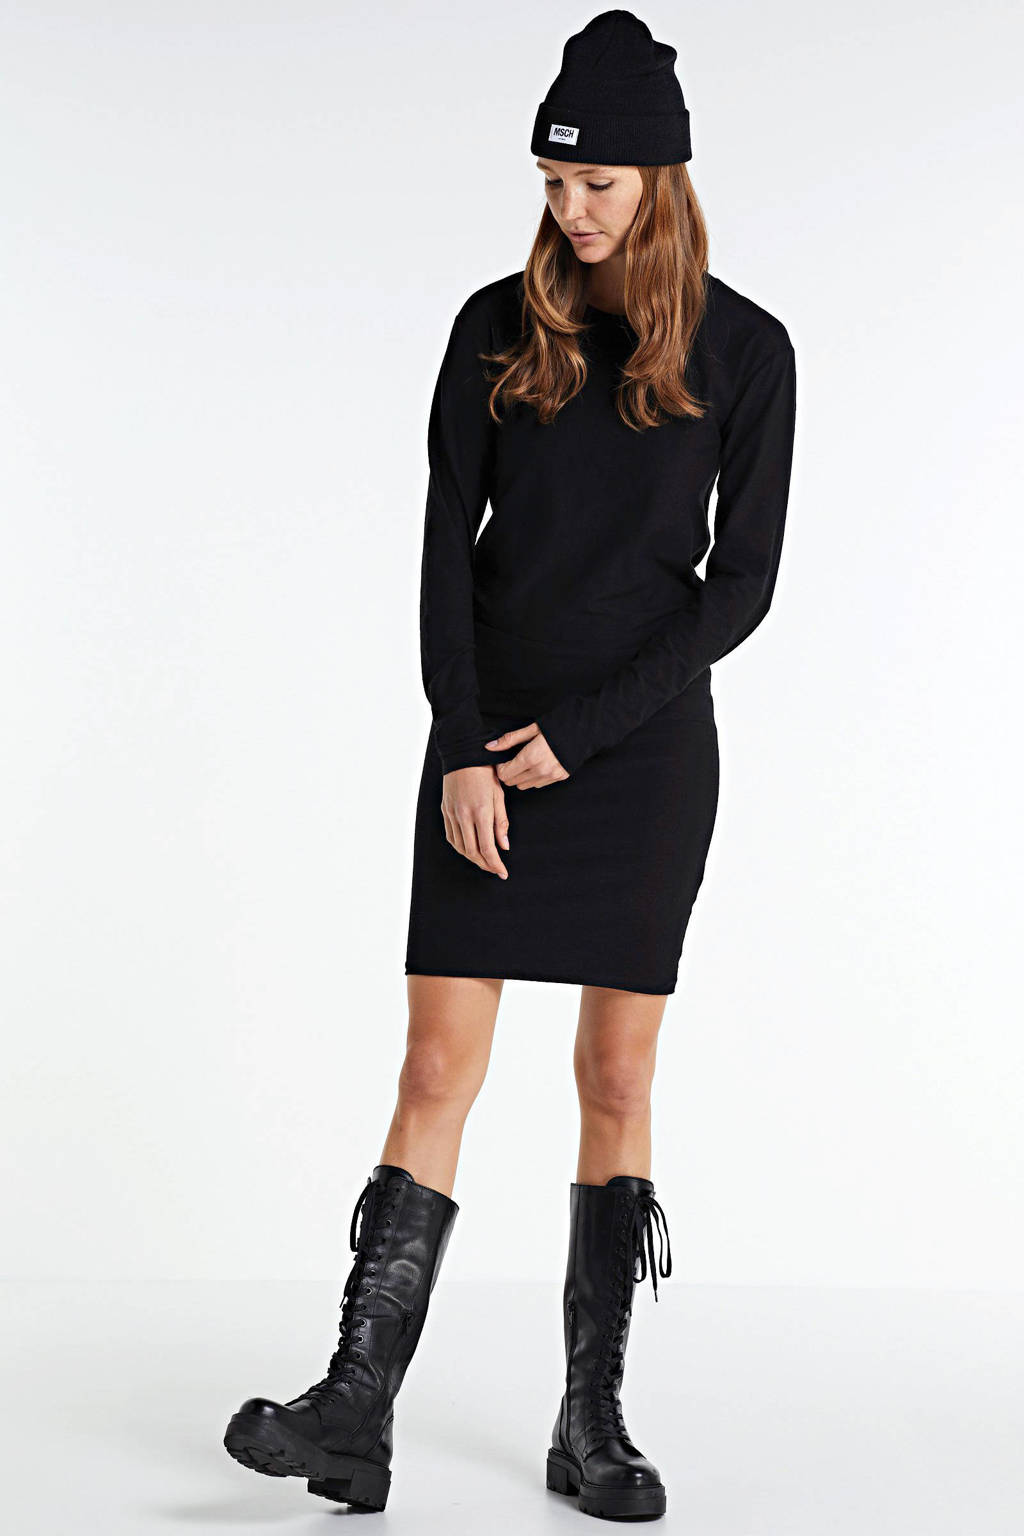 10DAYS jurk zwart, Zwart